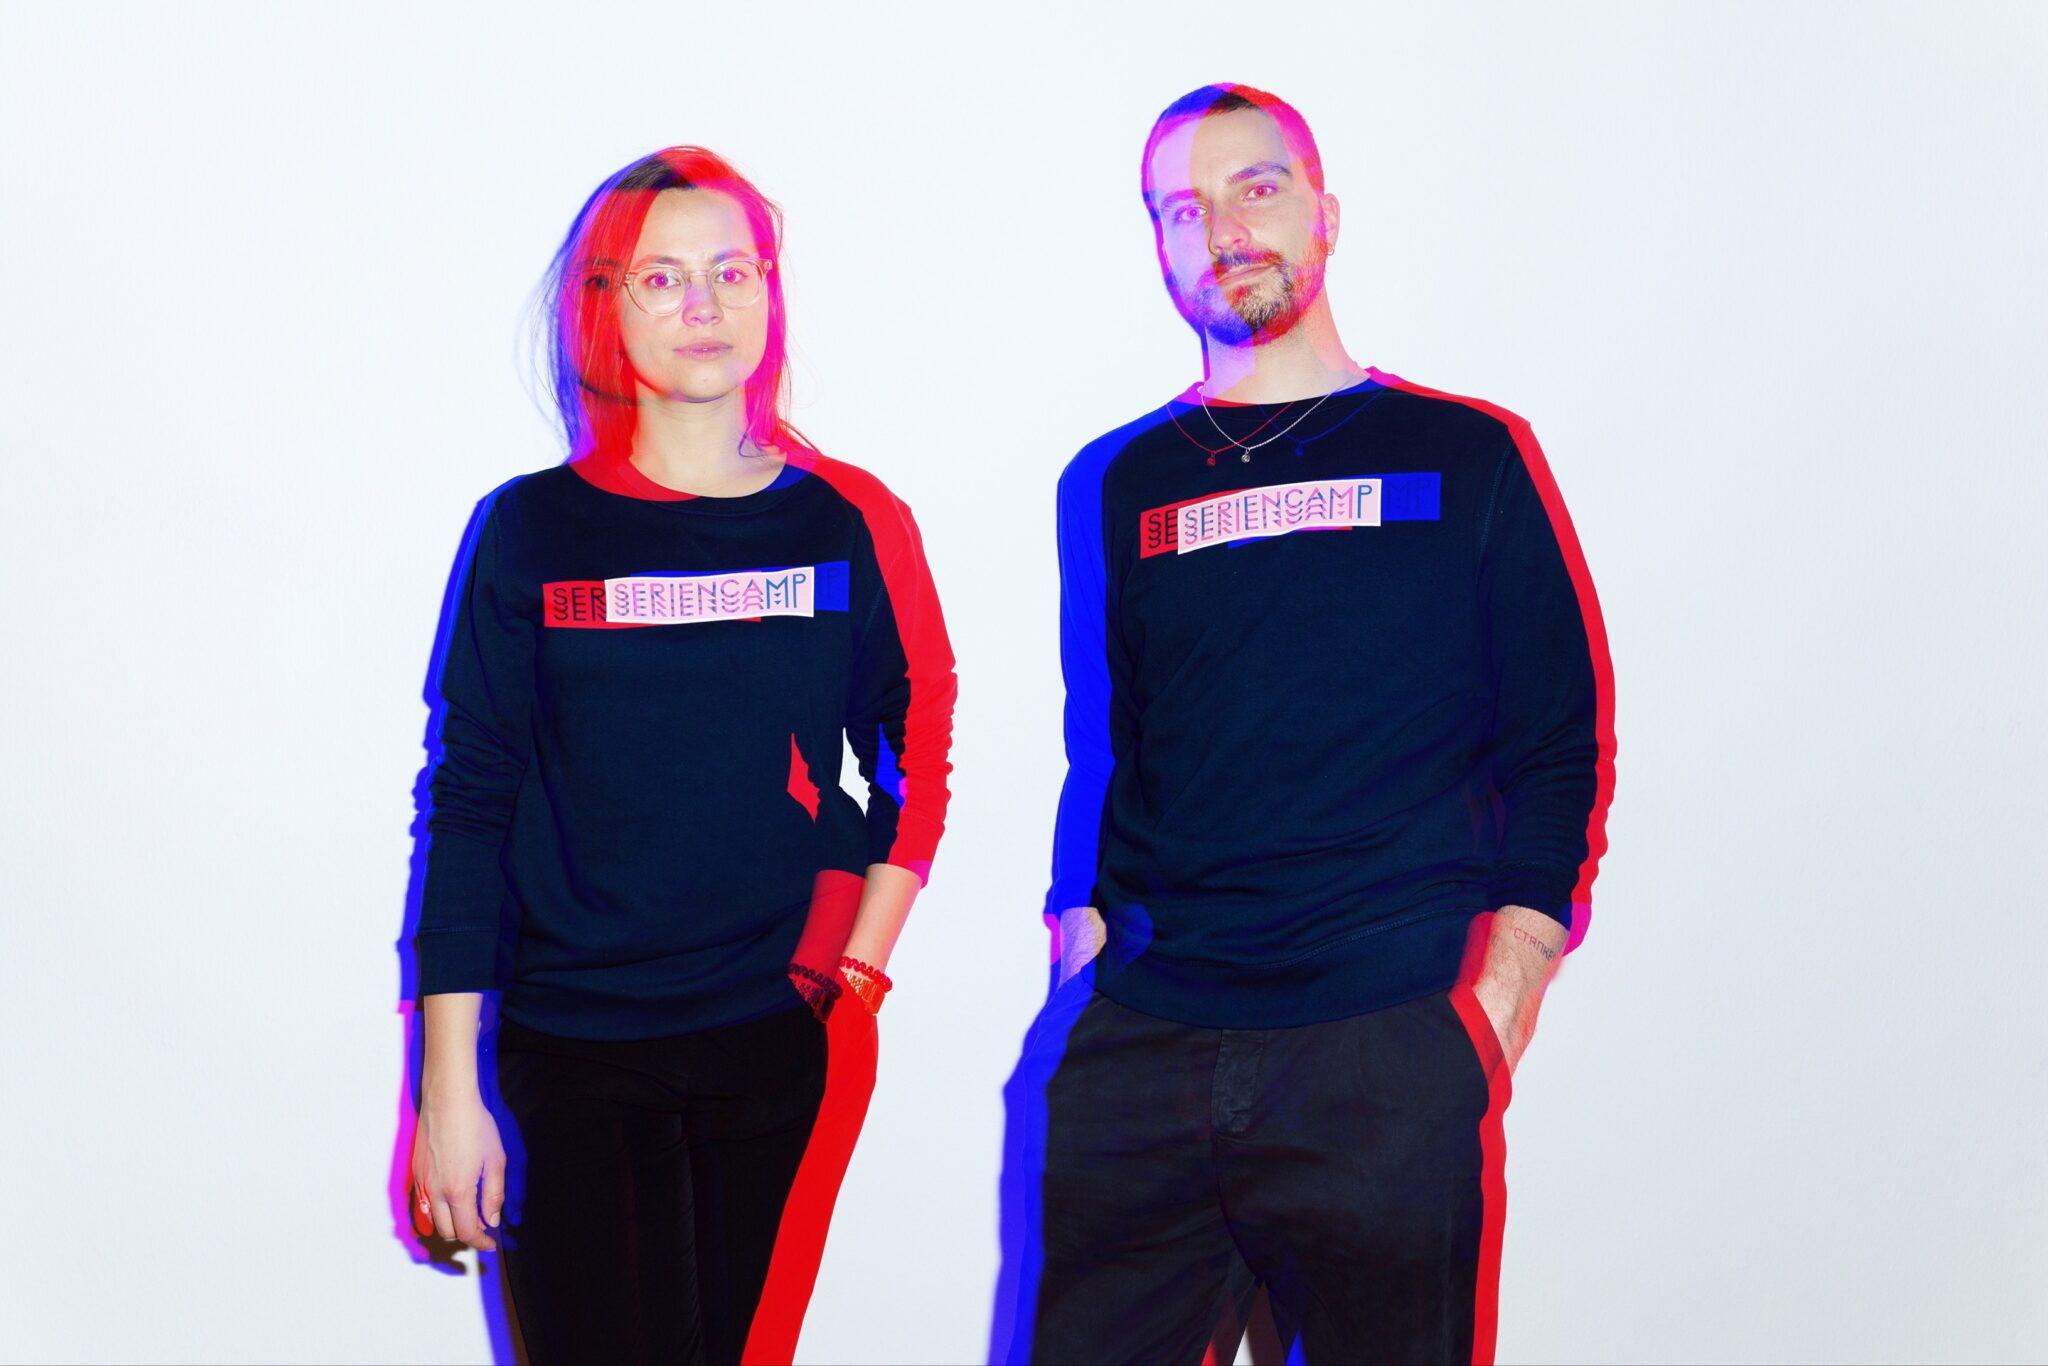 Seriencamp Festival 2020: Merch Shop